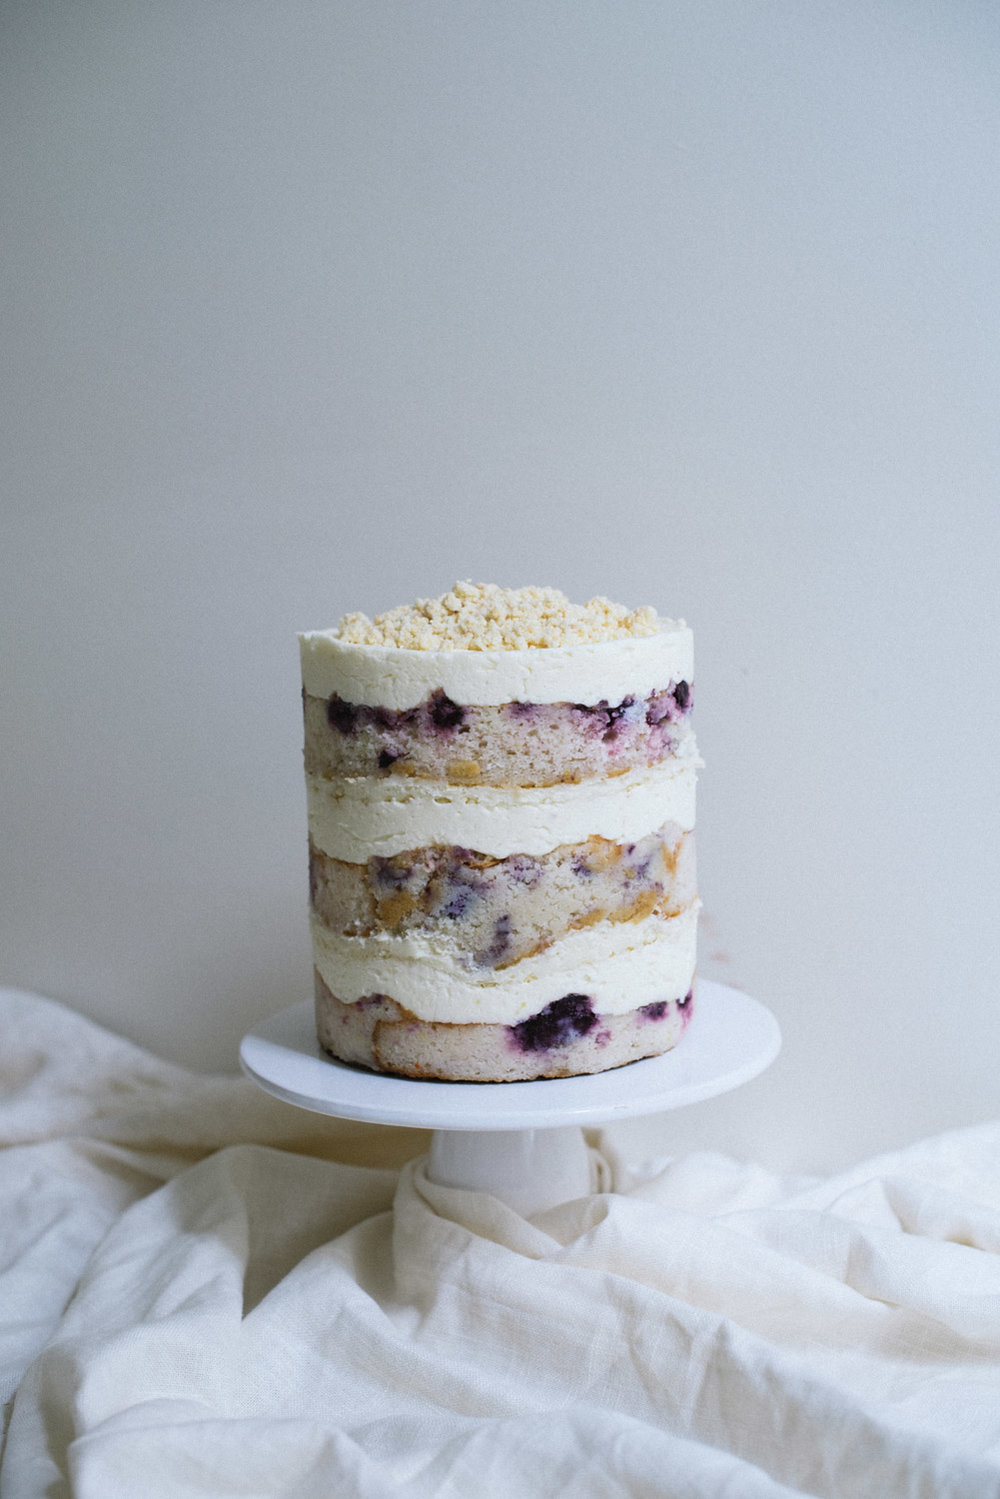 Blueberry Lemon Layer Cake  // Blueberry Cake, Lemon Buttercream, Cheesecake, White Chocolate Milk Crumb